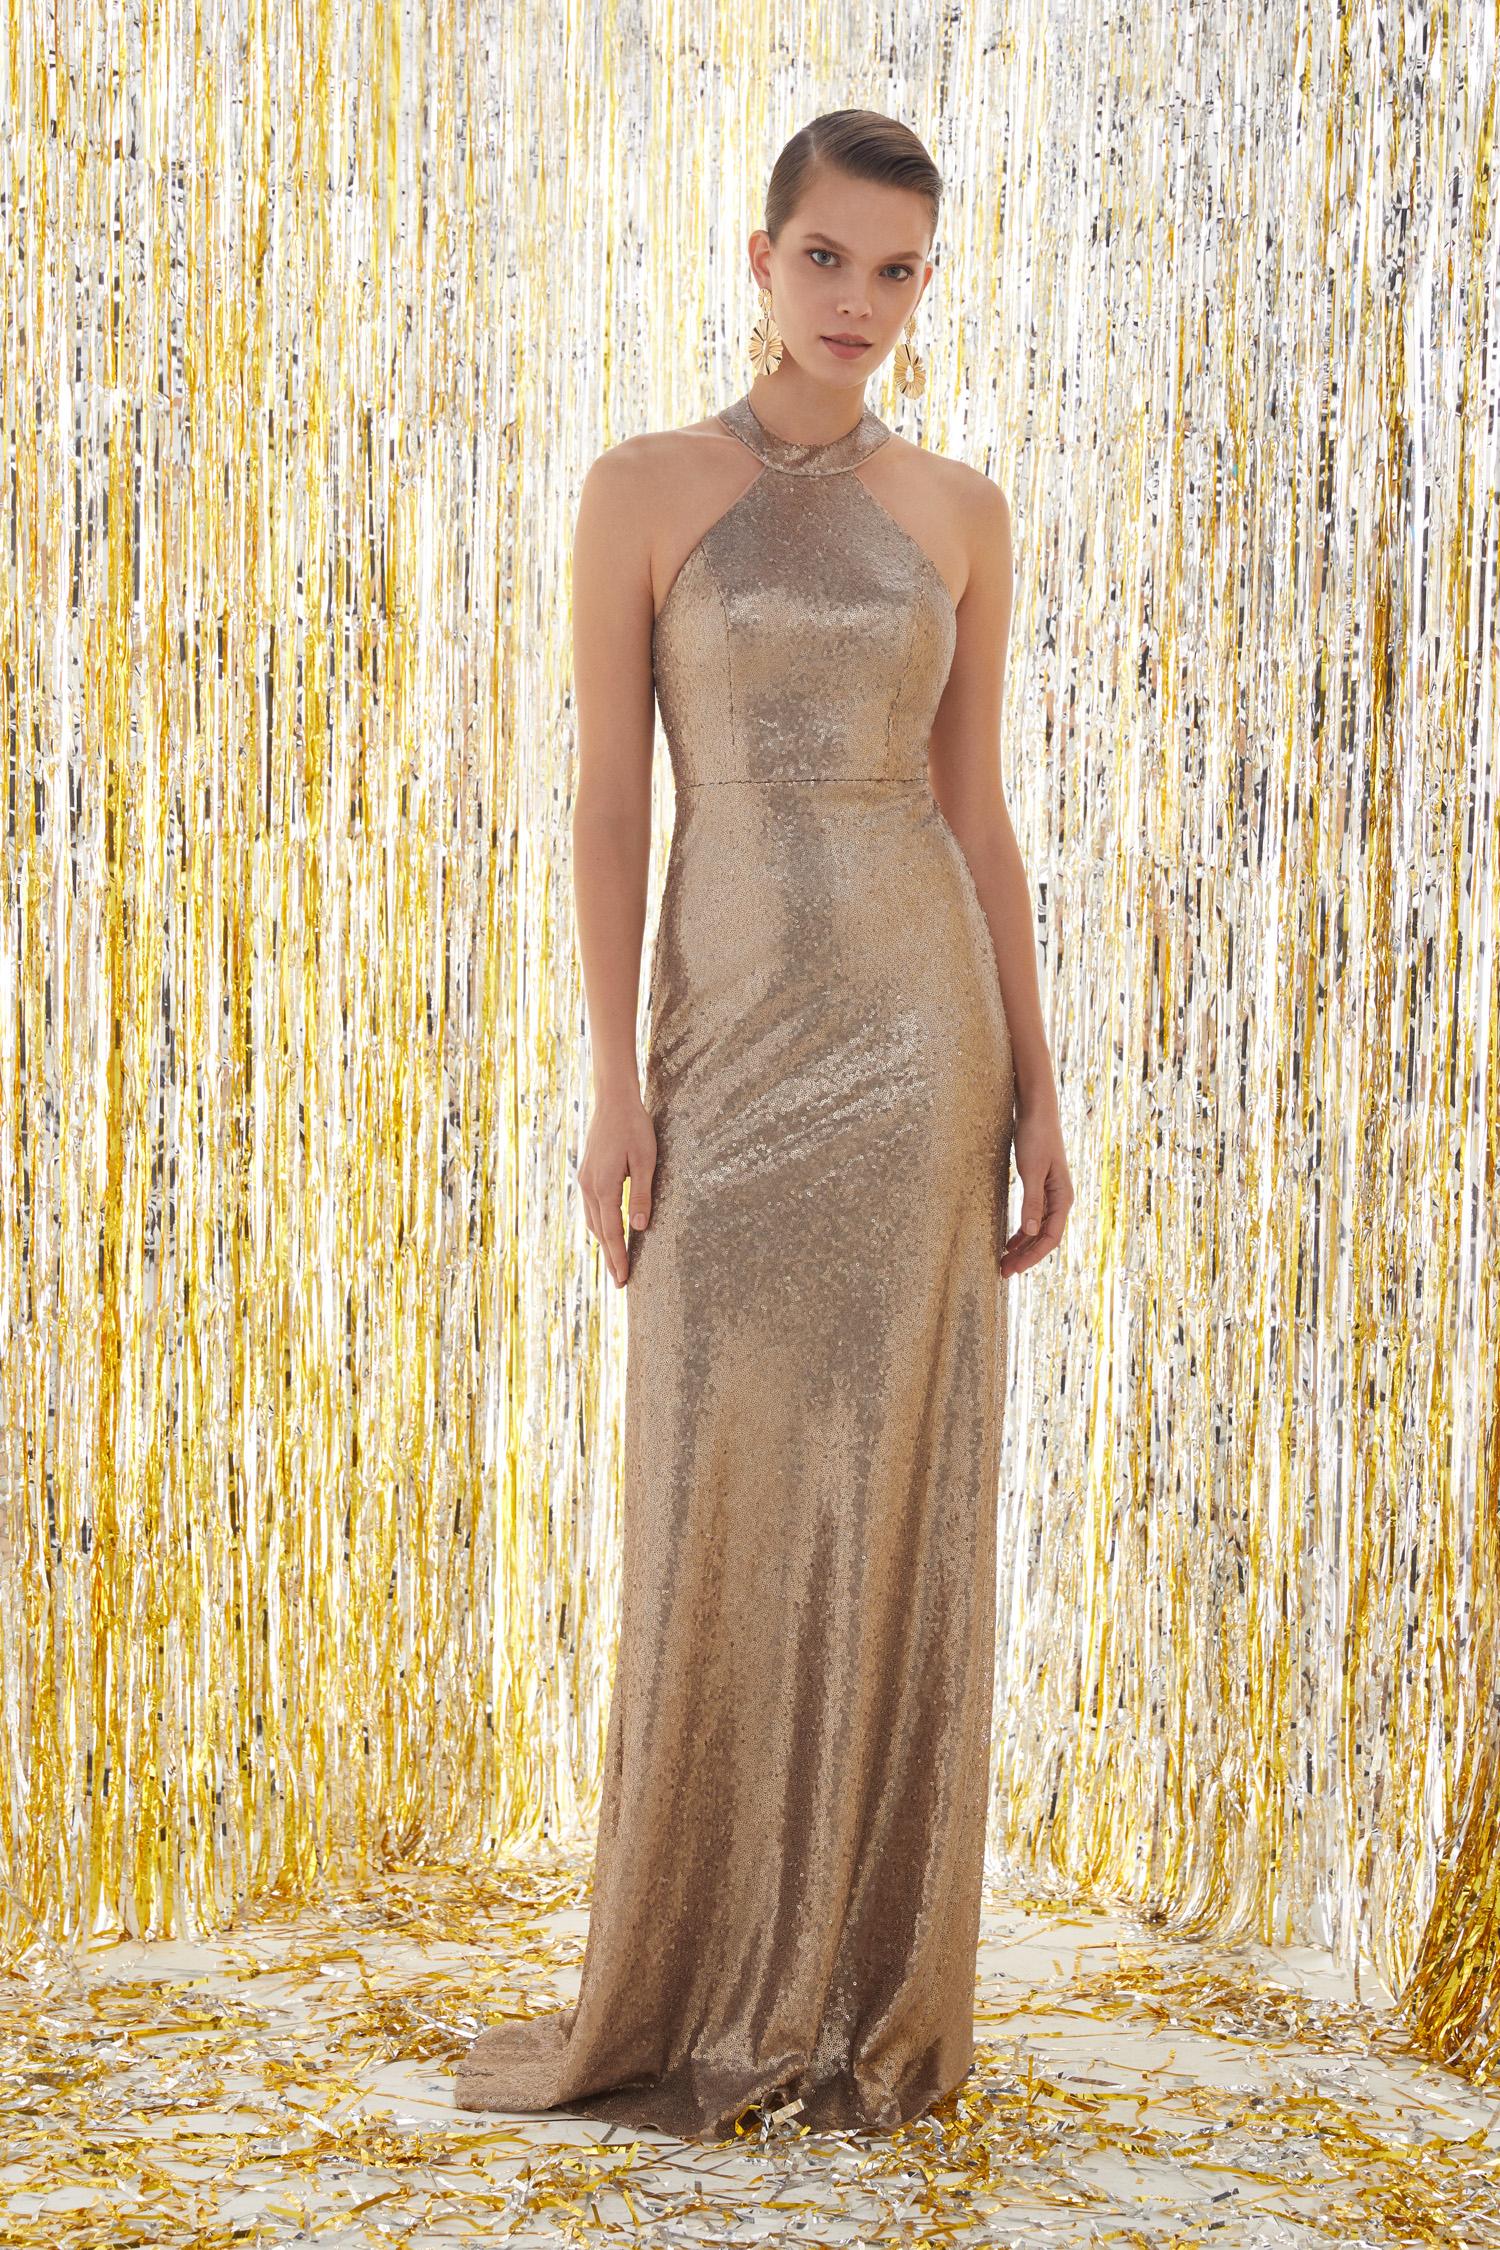 Halter Yaka Altın Rengi Abiye Elbise - Thumbnail